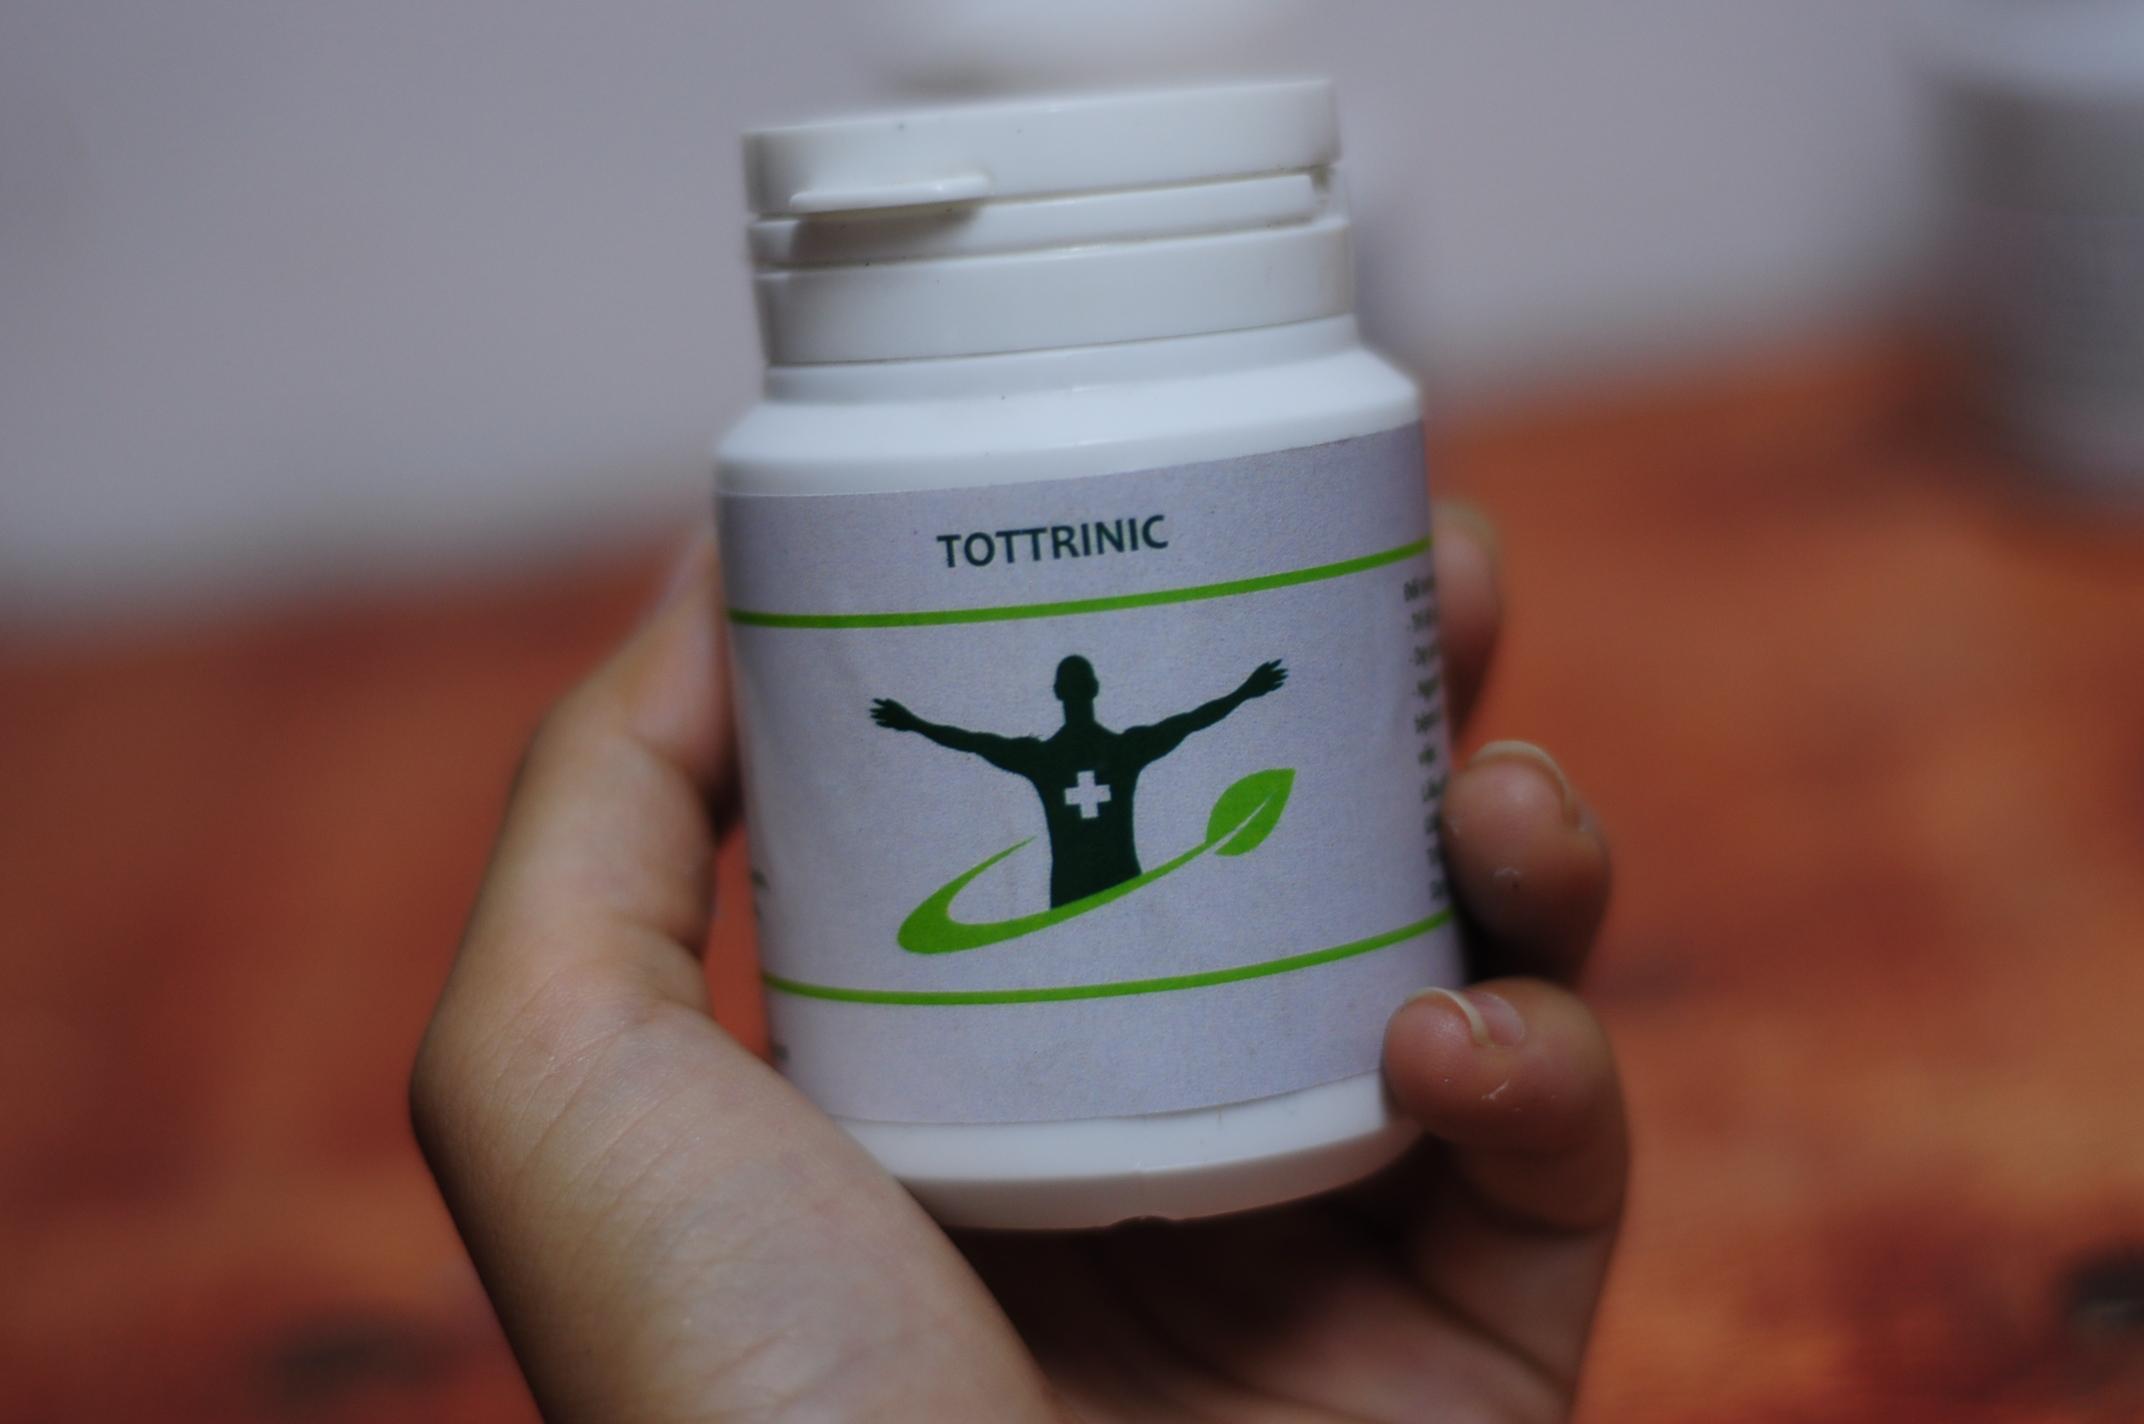 Tottrinic